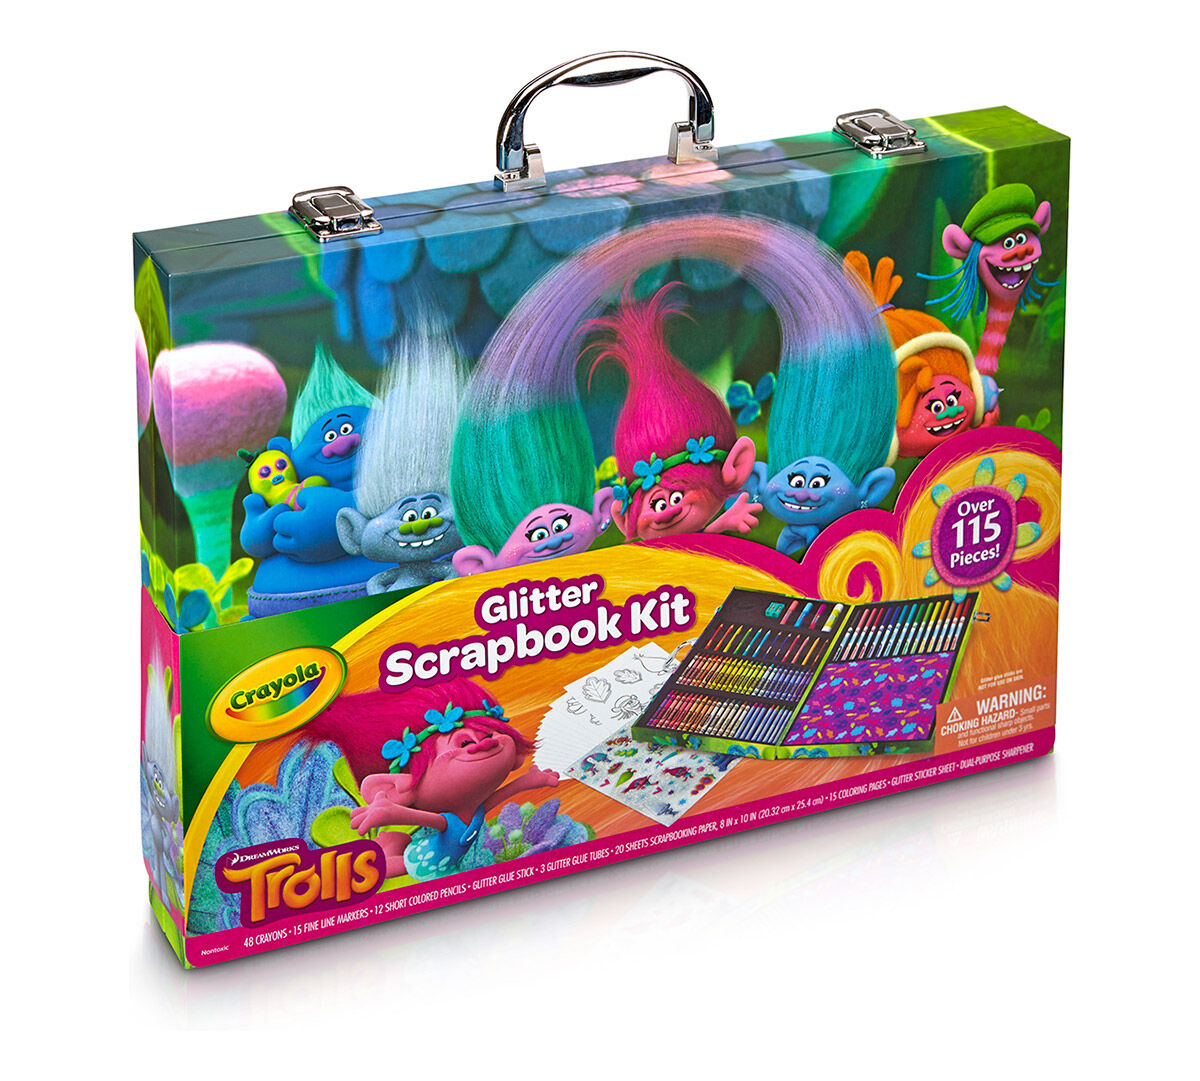 Trolls Glitter Scrapbooking Set Crayola